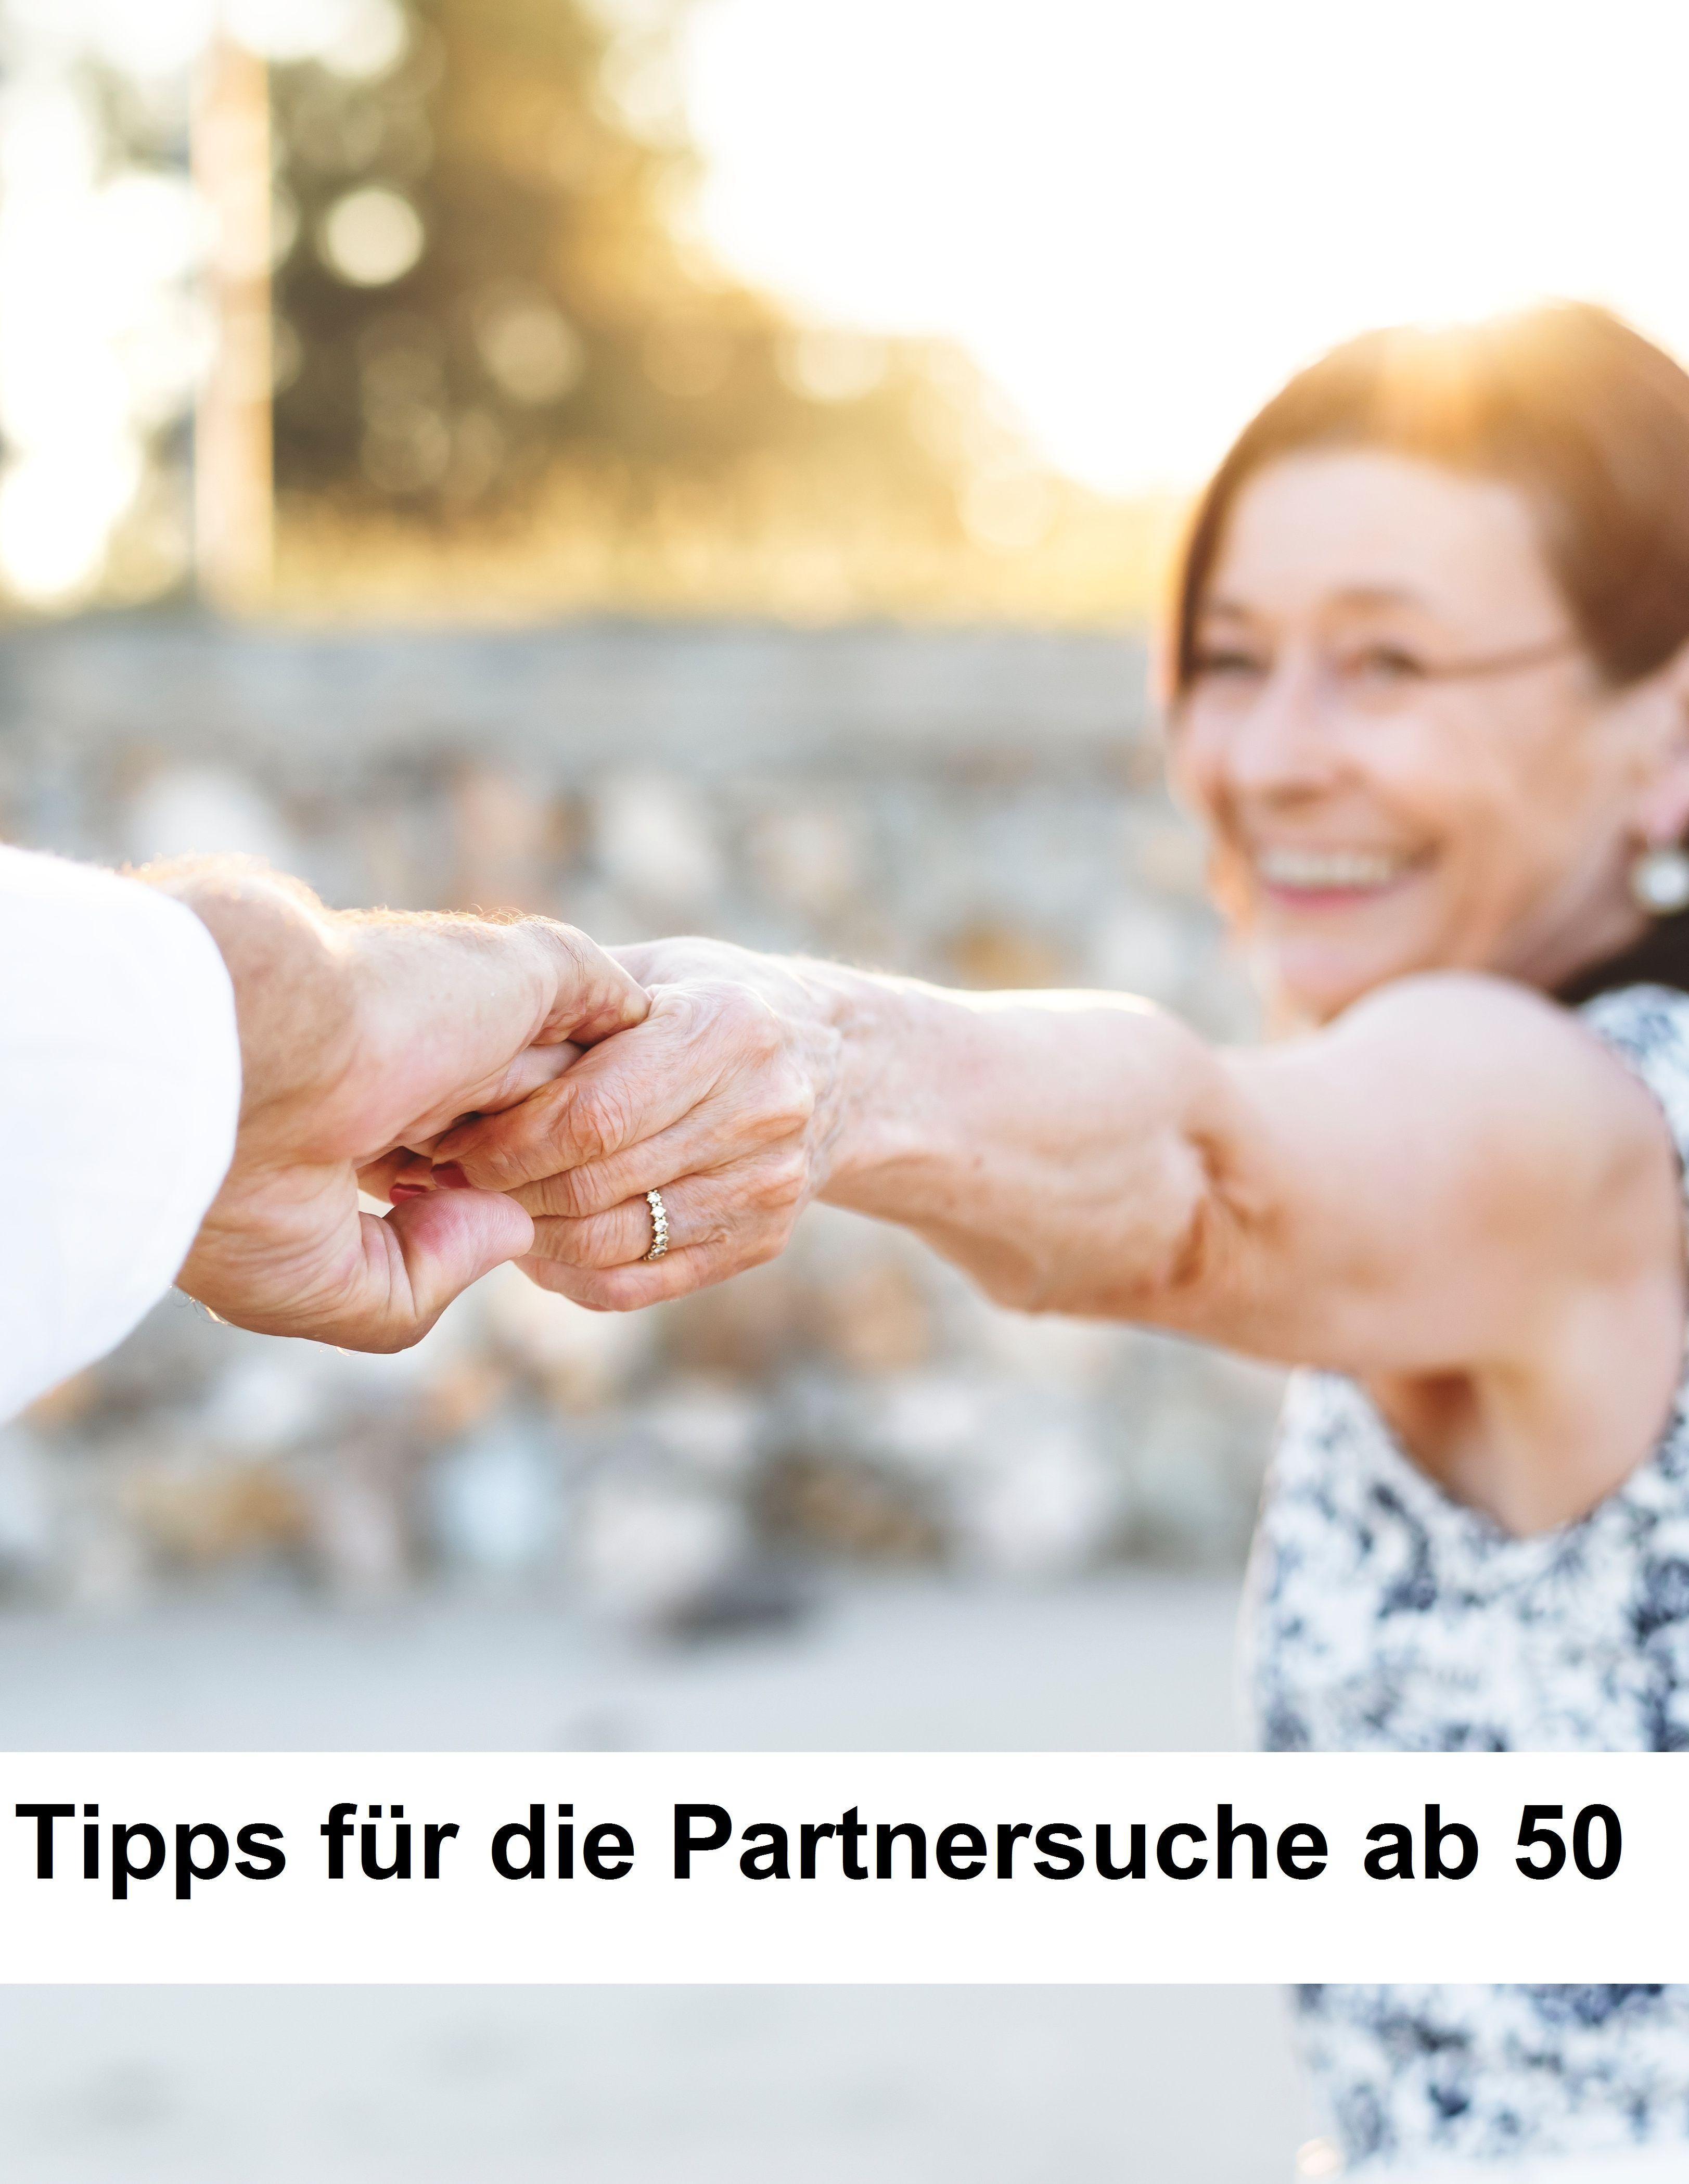 Internet partnersuche tipps